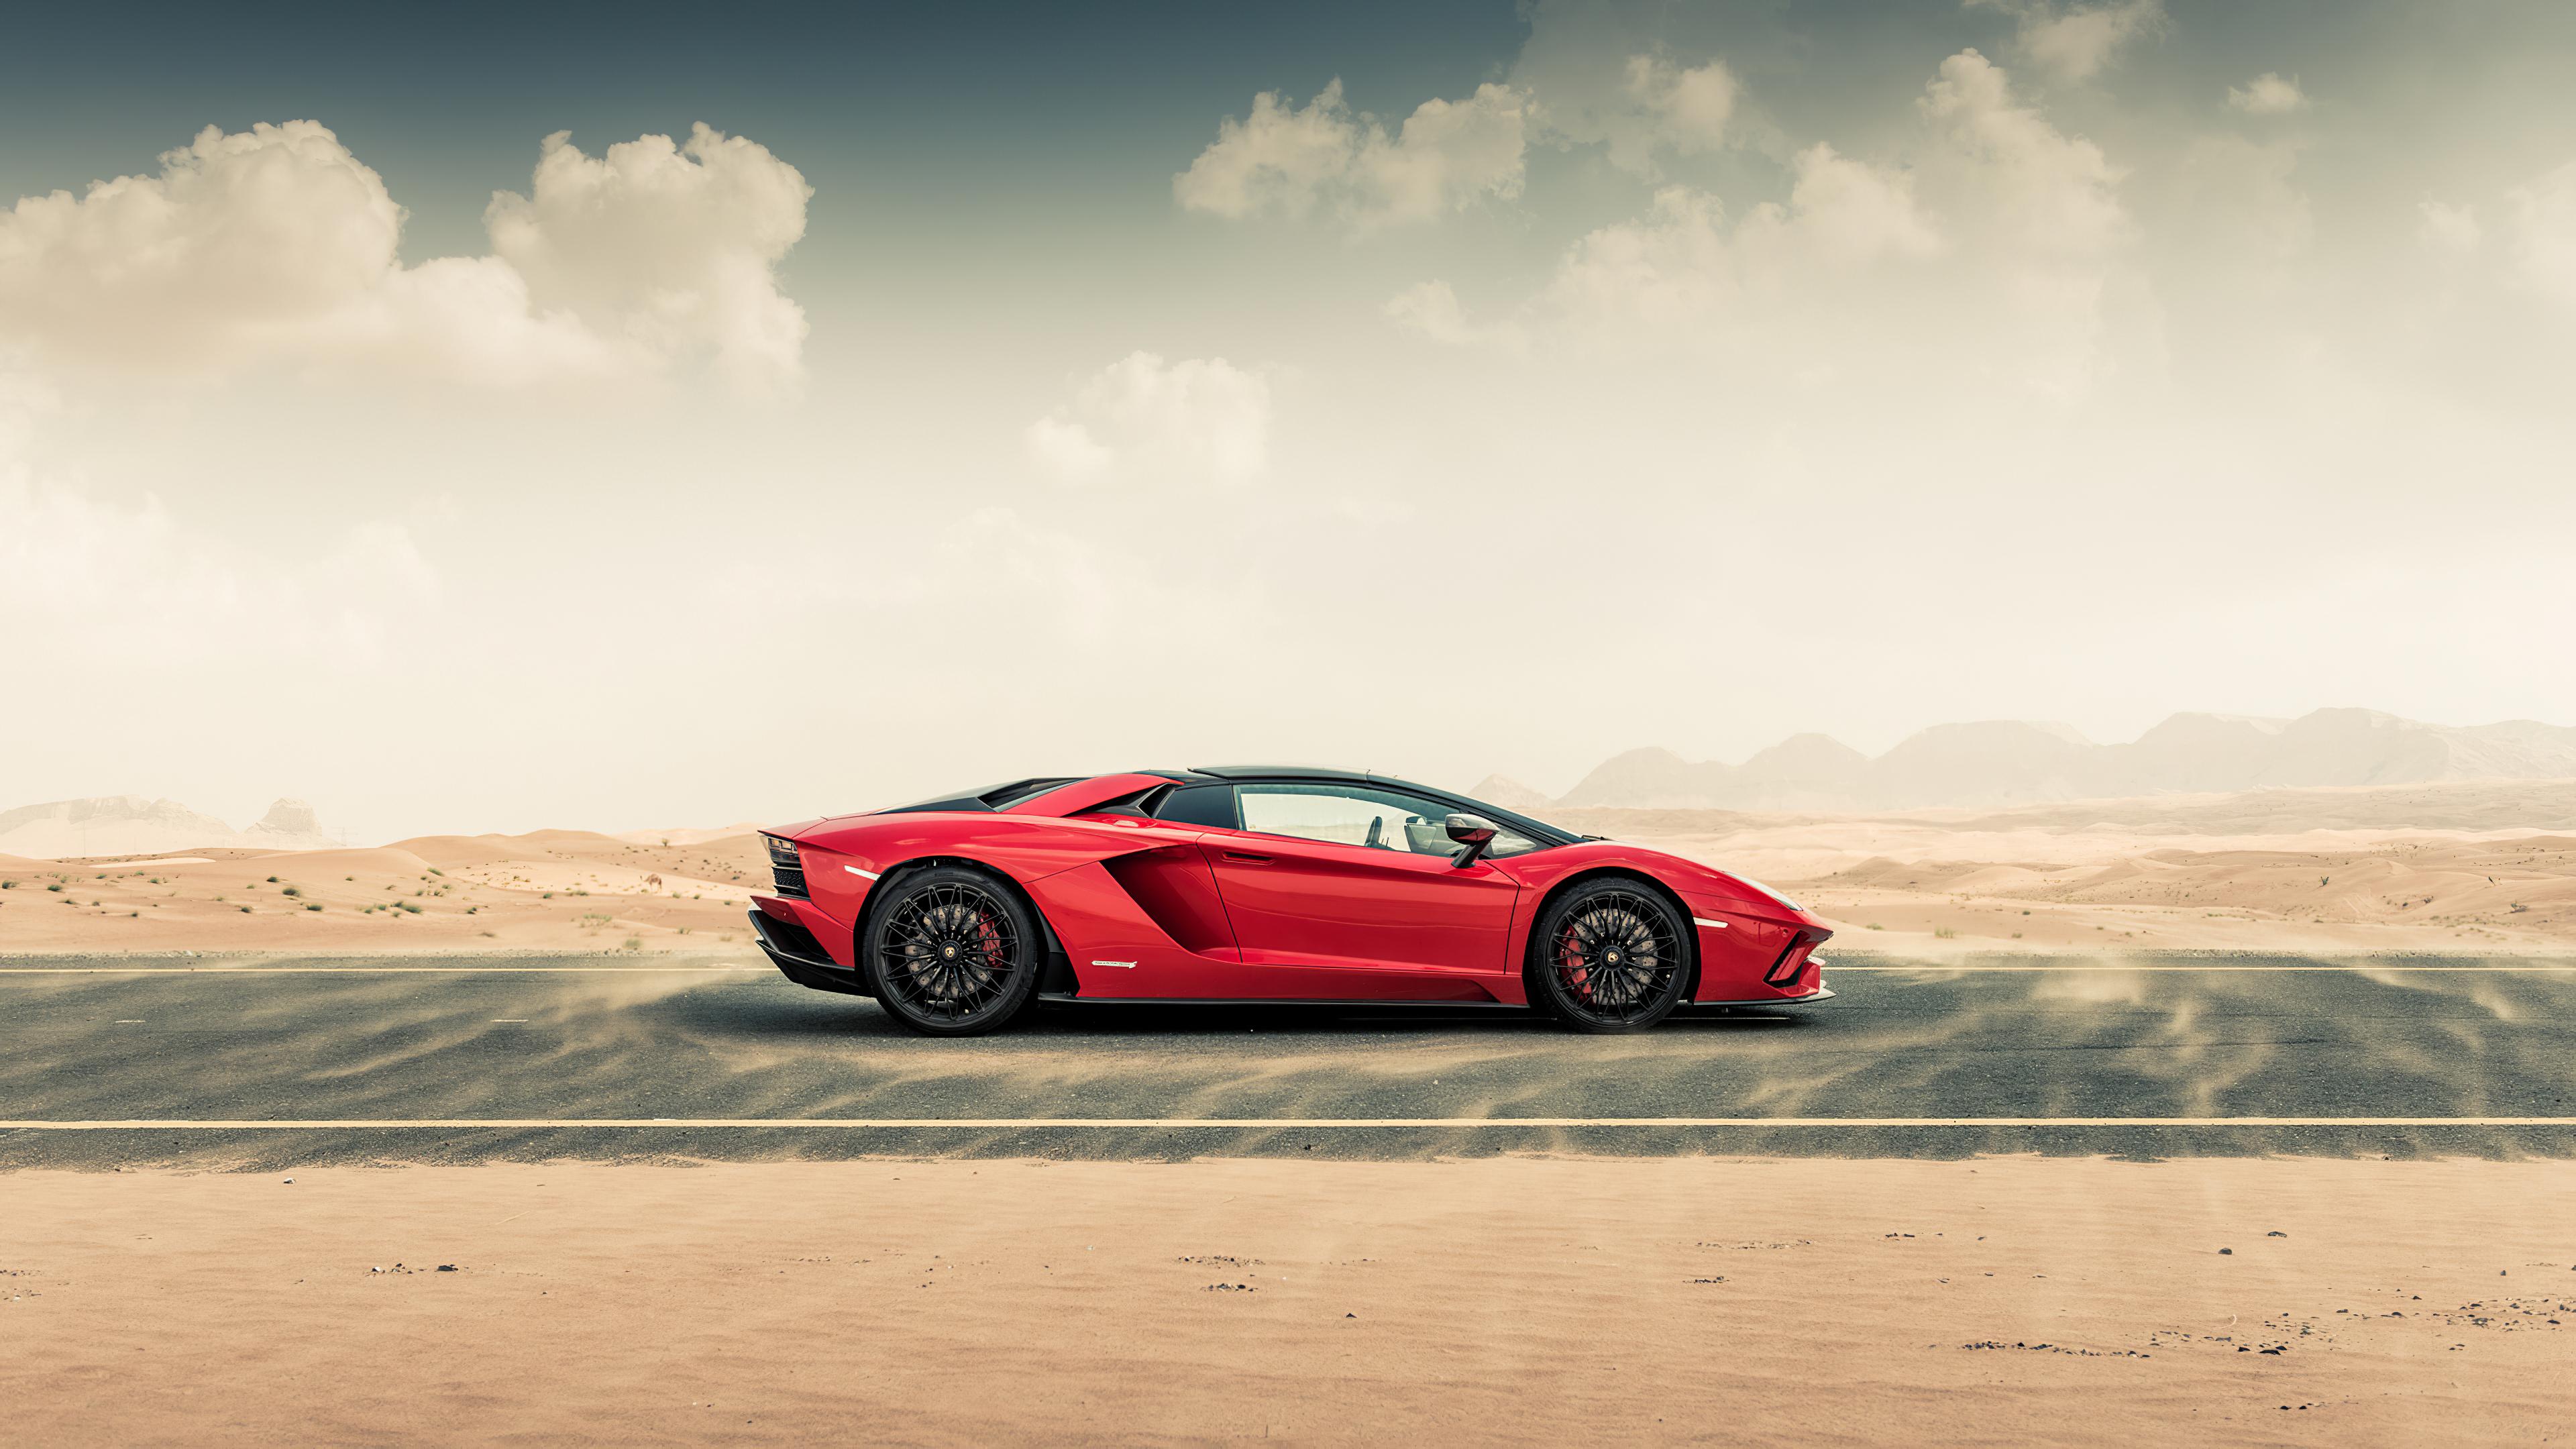 lamborghini aventador s roadster 2020 side view 1579649269 - Lamborghini Aventador S Roadster 2020 Side View -